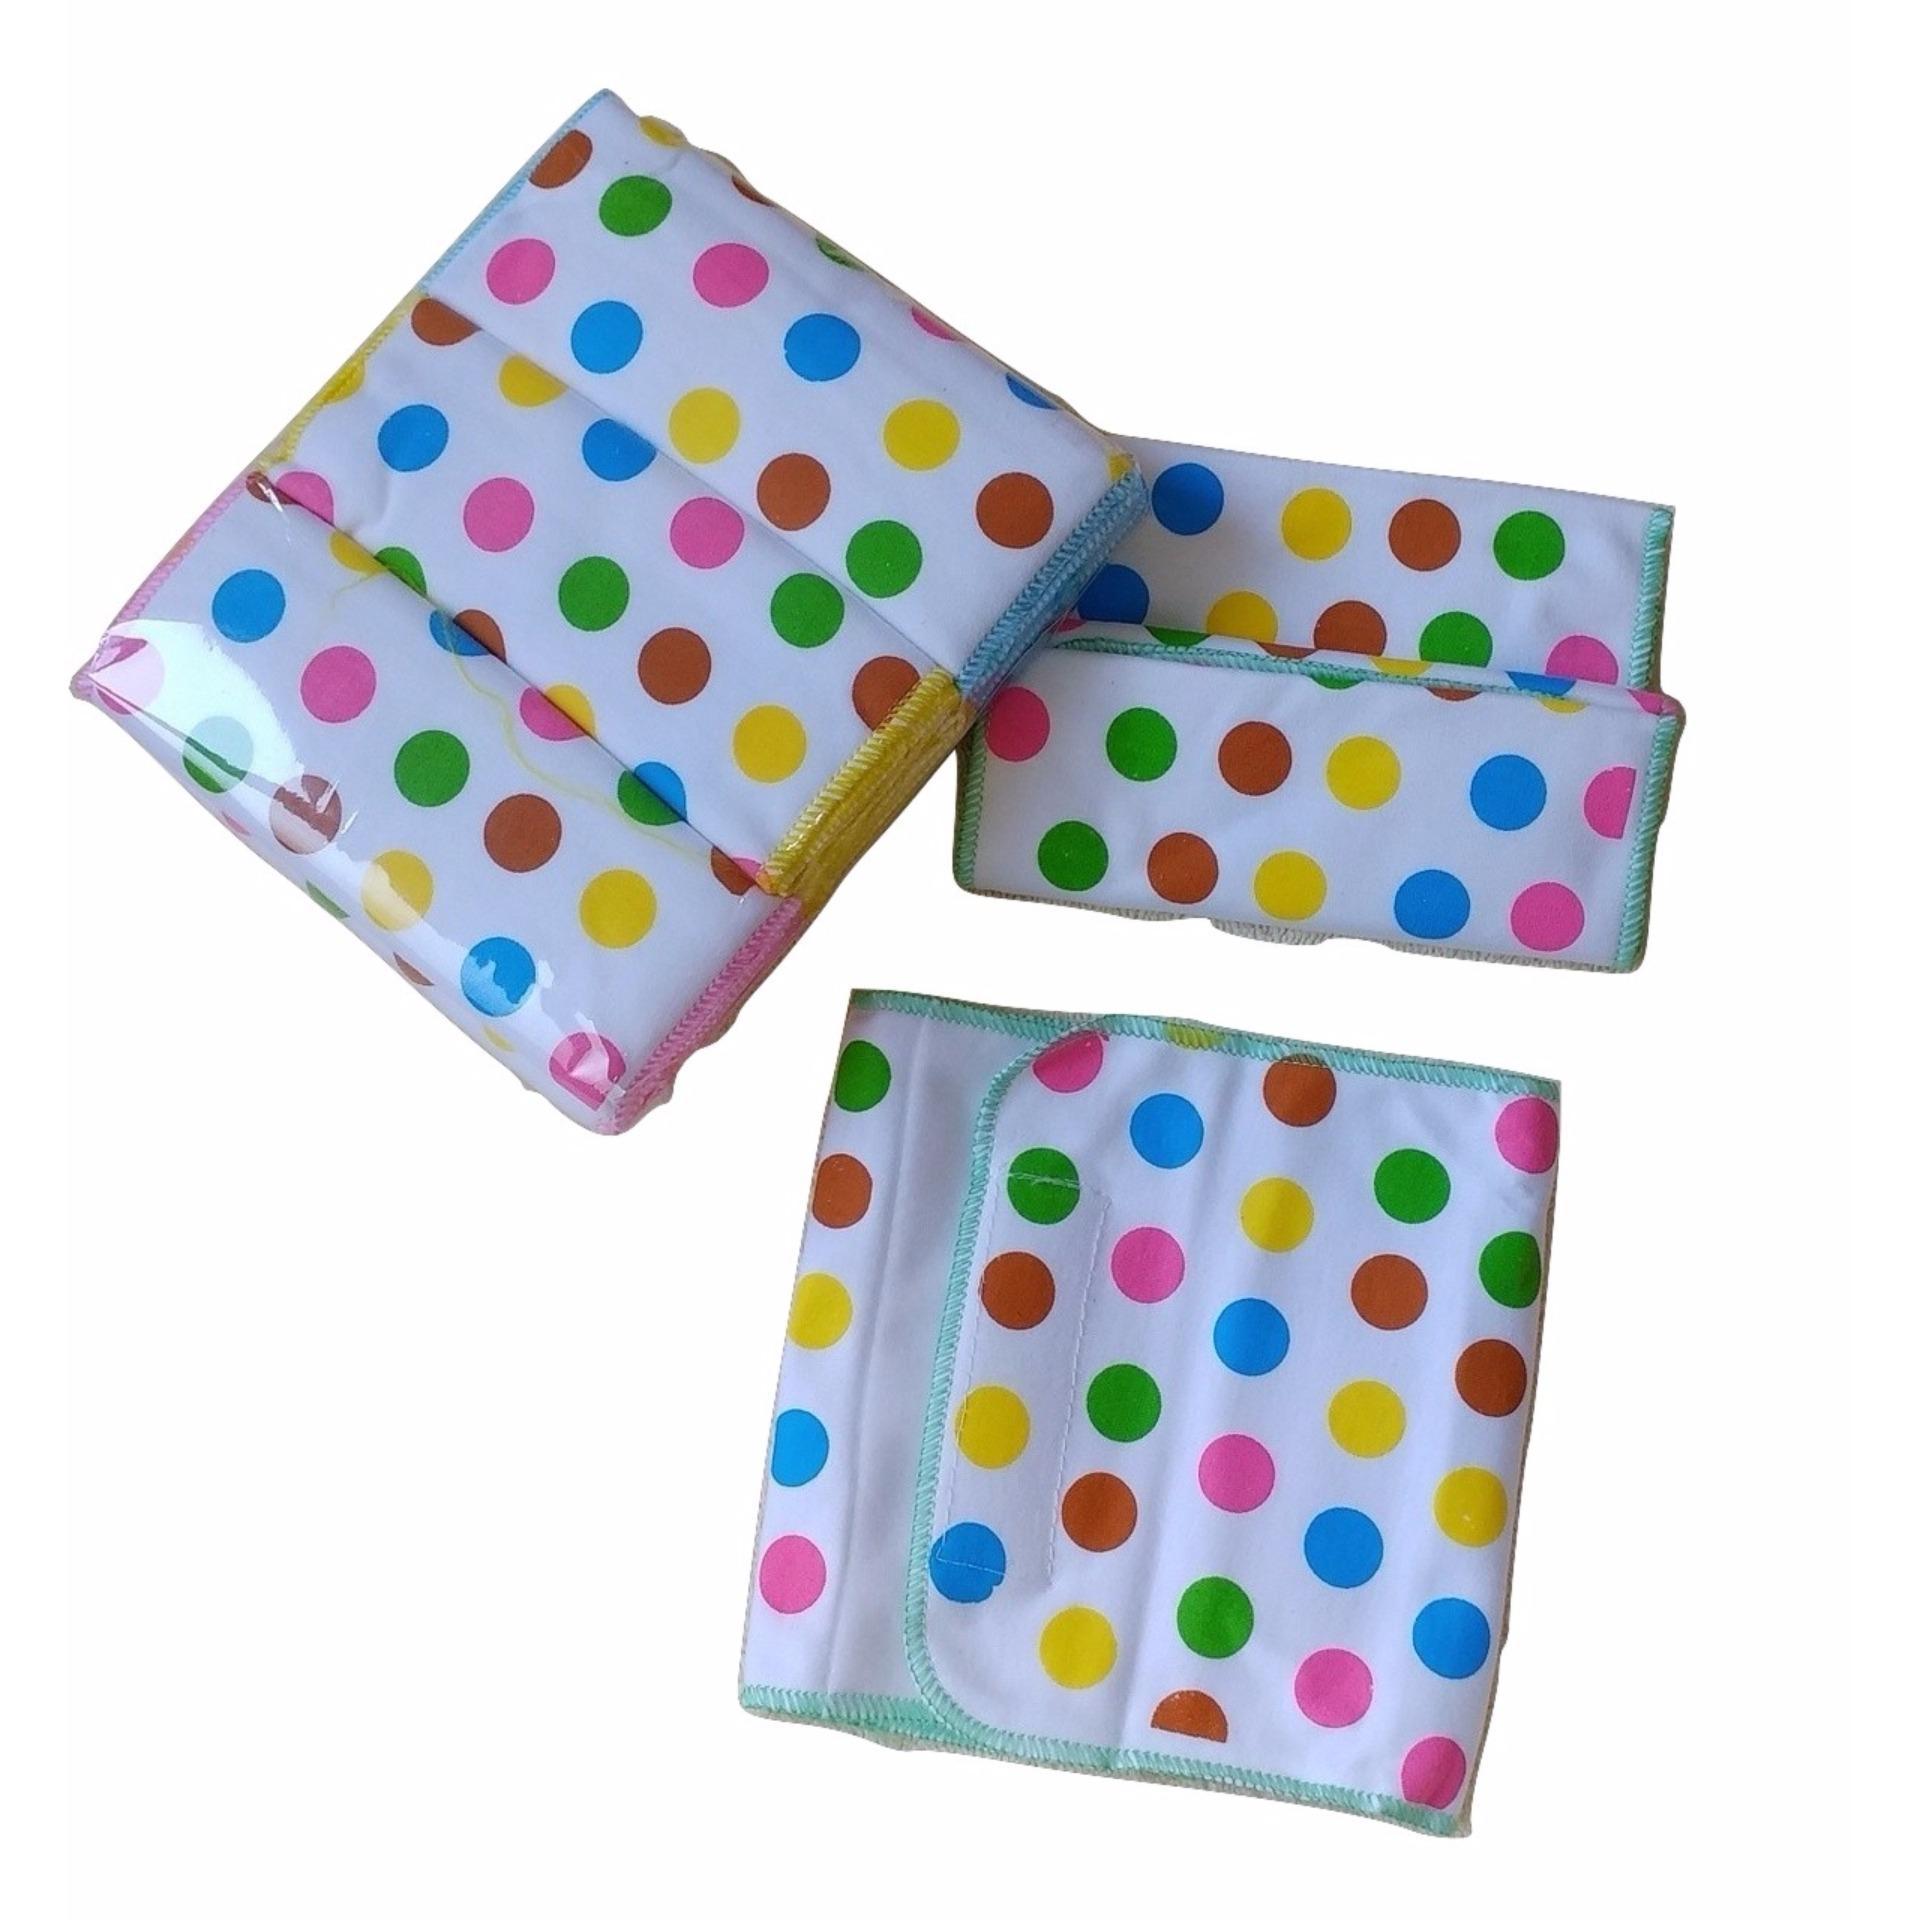 Hot Deals Jelova Angela Selusin Gurita Rekat Baby Bayi Motif Polka Premium Quality 12pcs terbaik murah